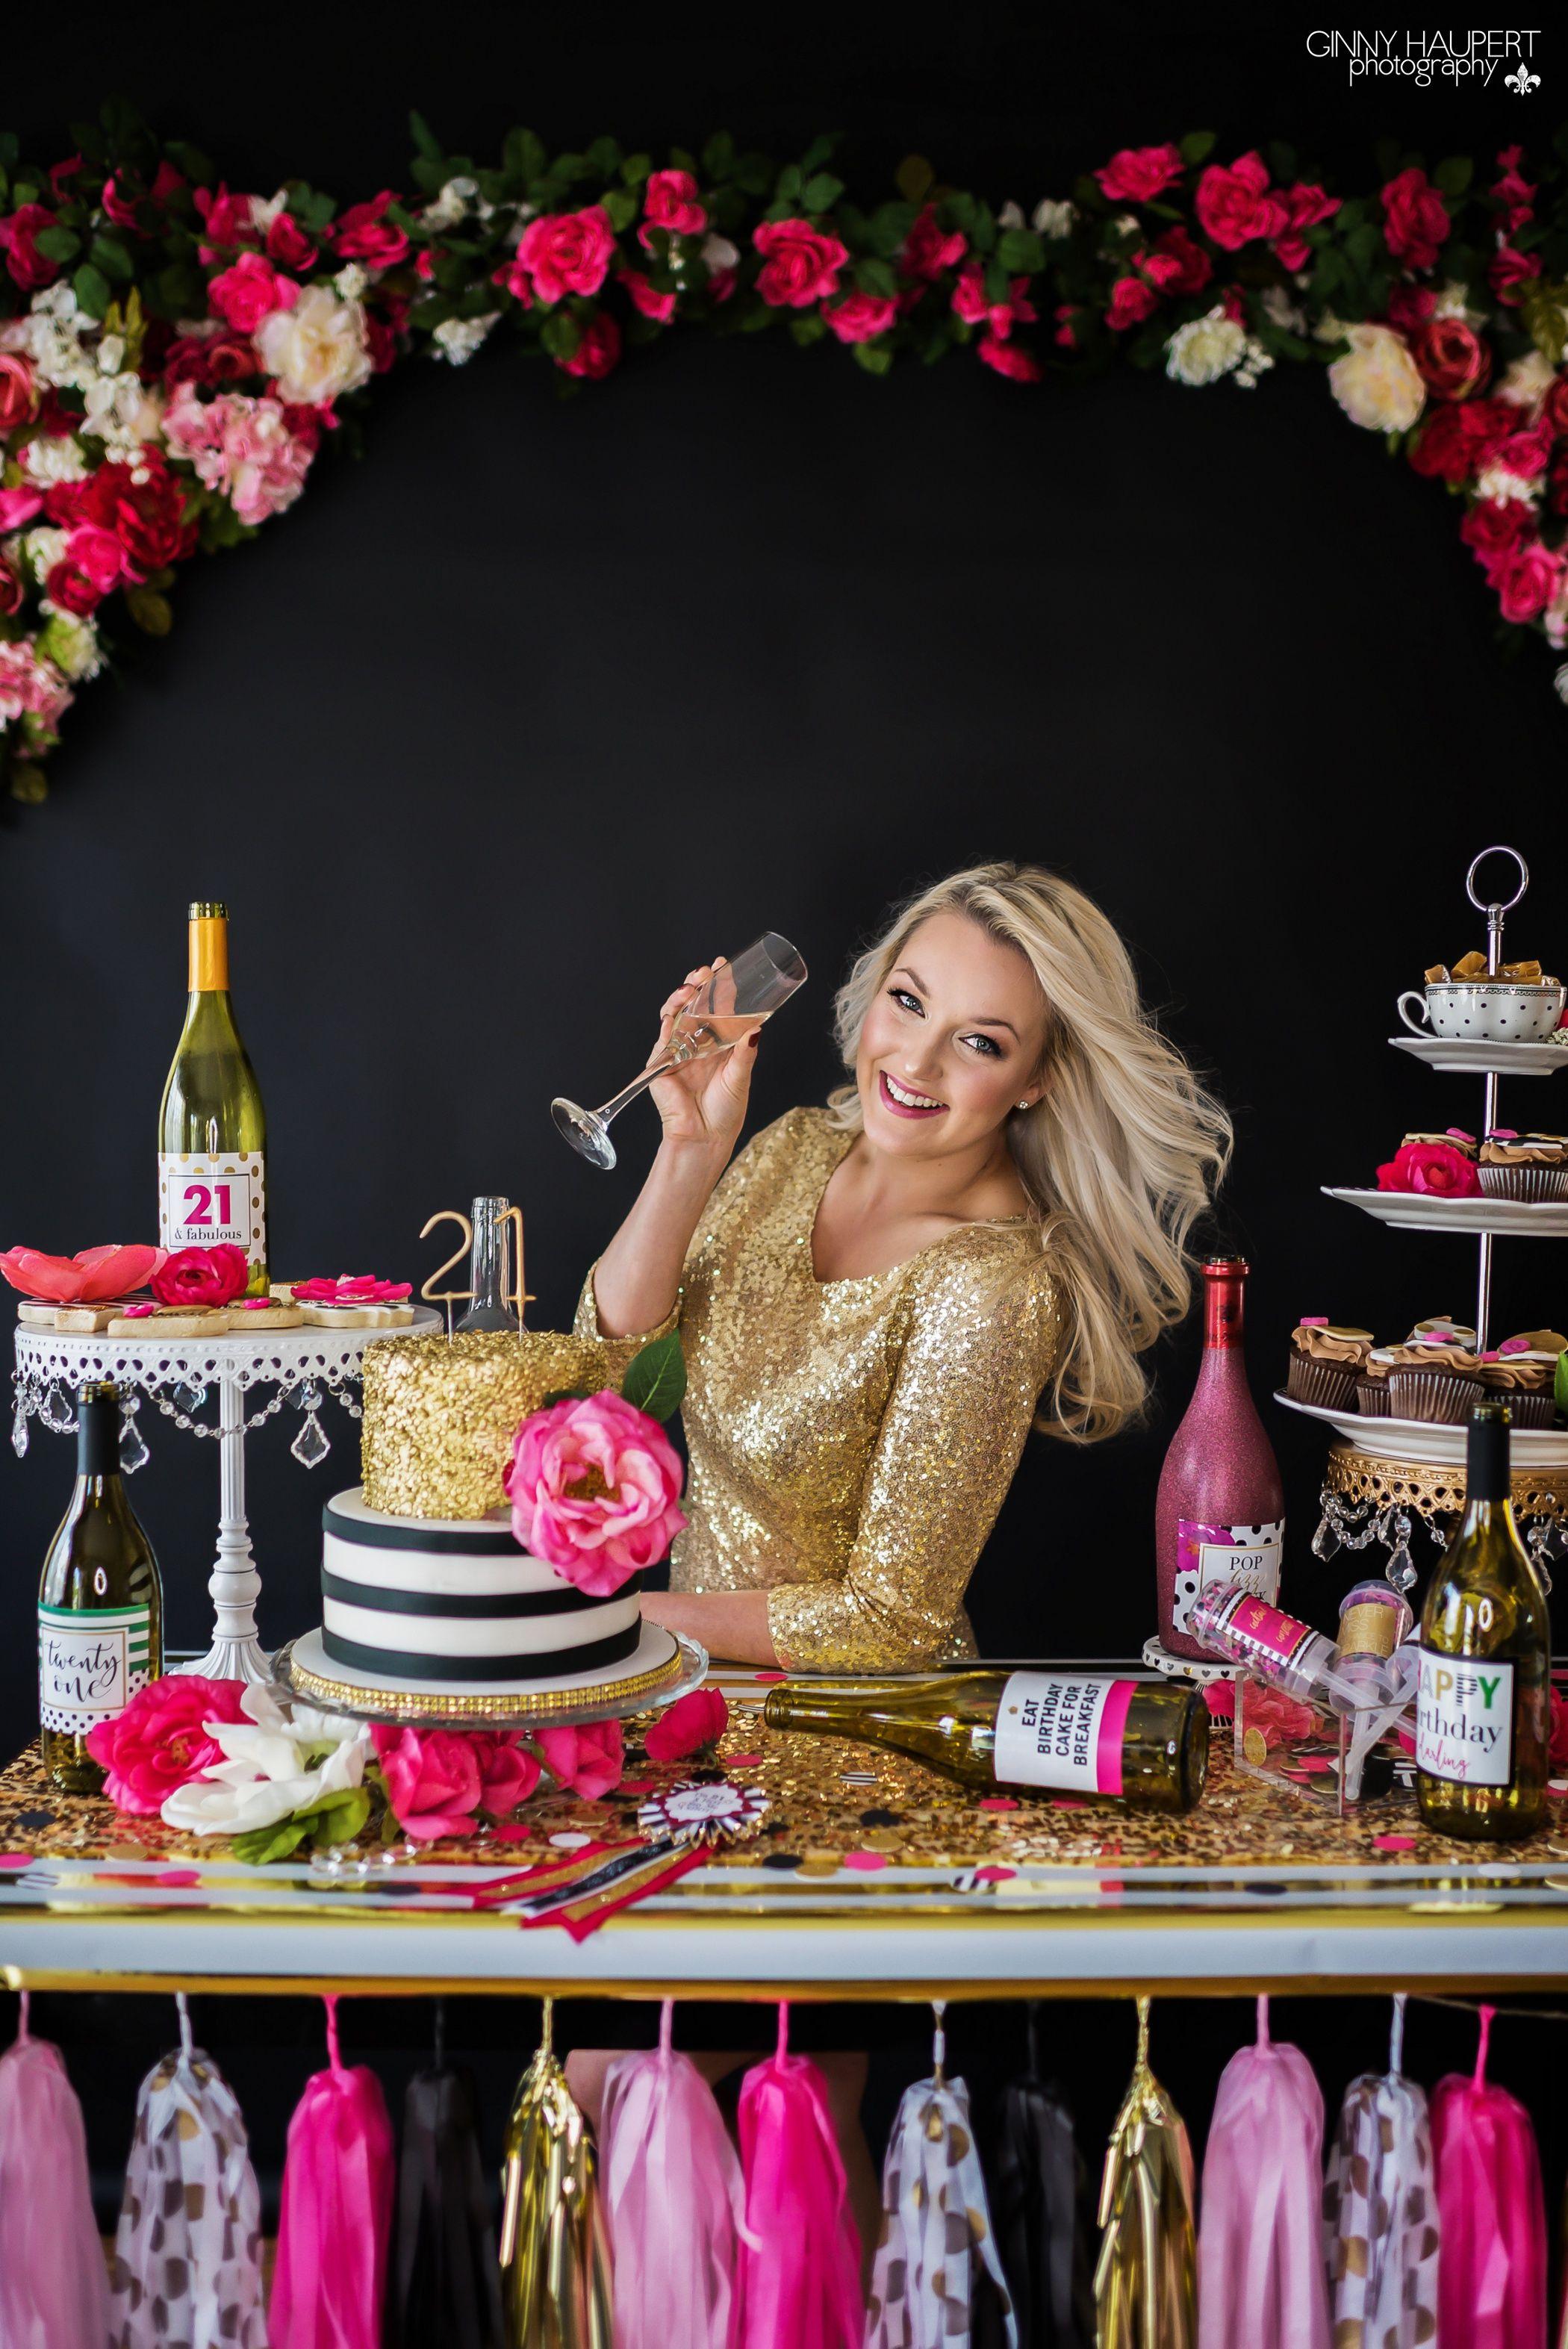 Adult Cake Smash Photoshoot Dirty 30 21st Birthday Denver Photographer Kate Spade Gold Pink Black Party Decor Backdrop